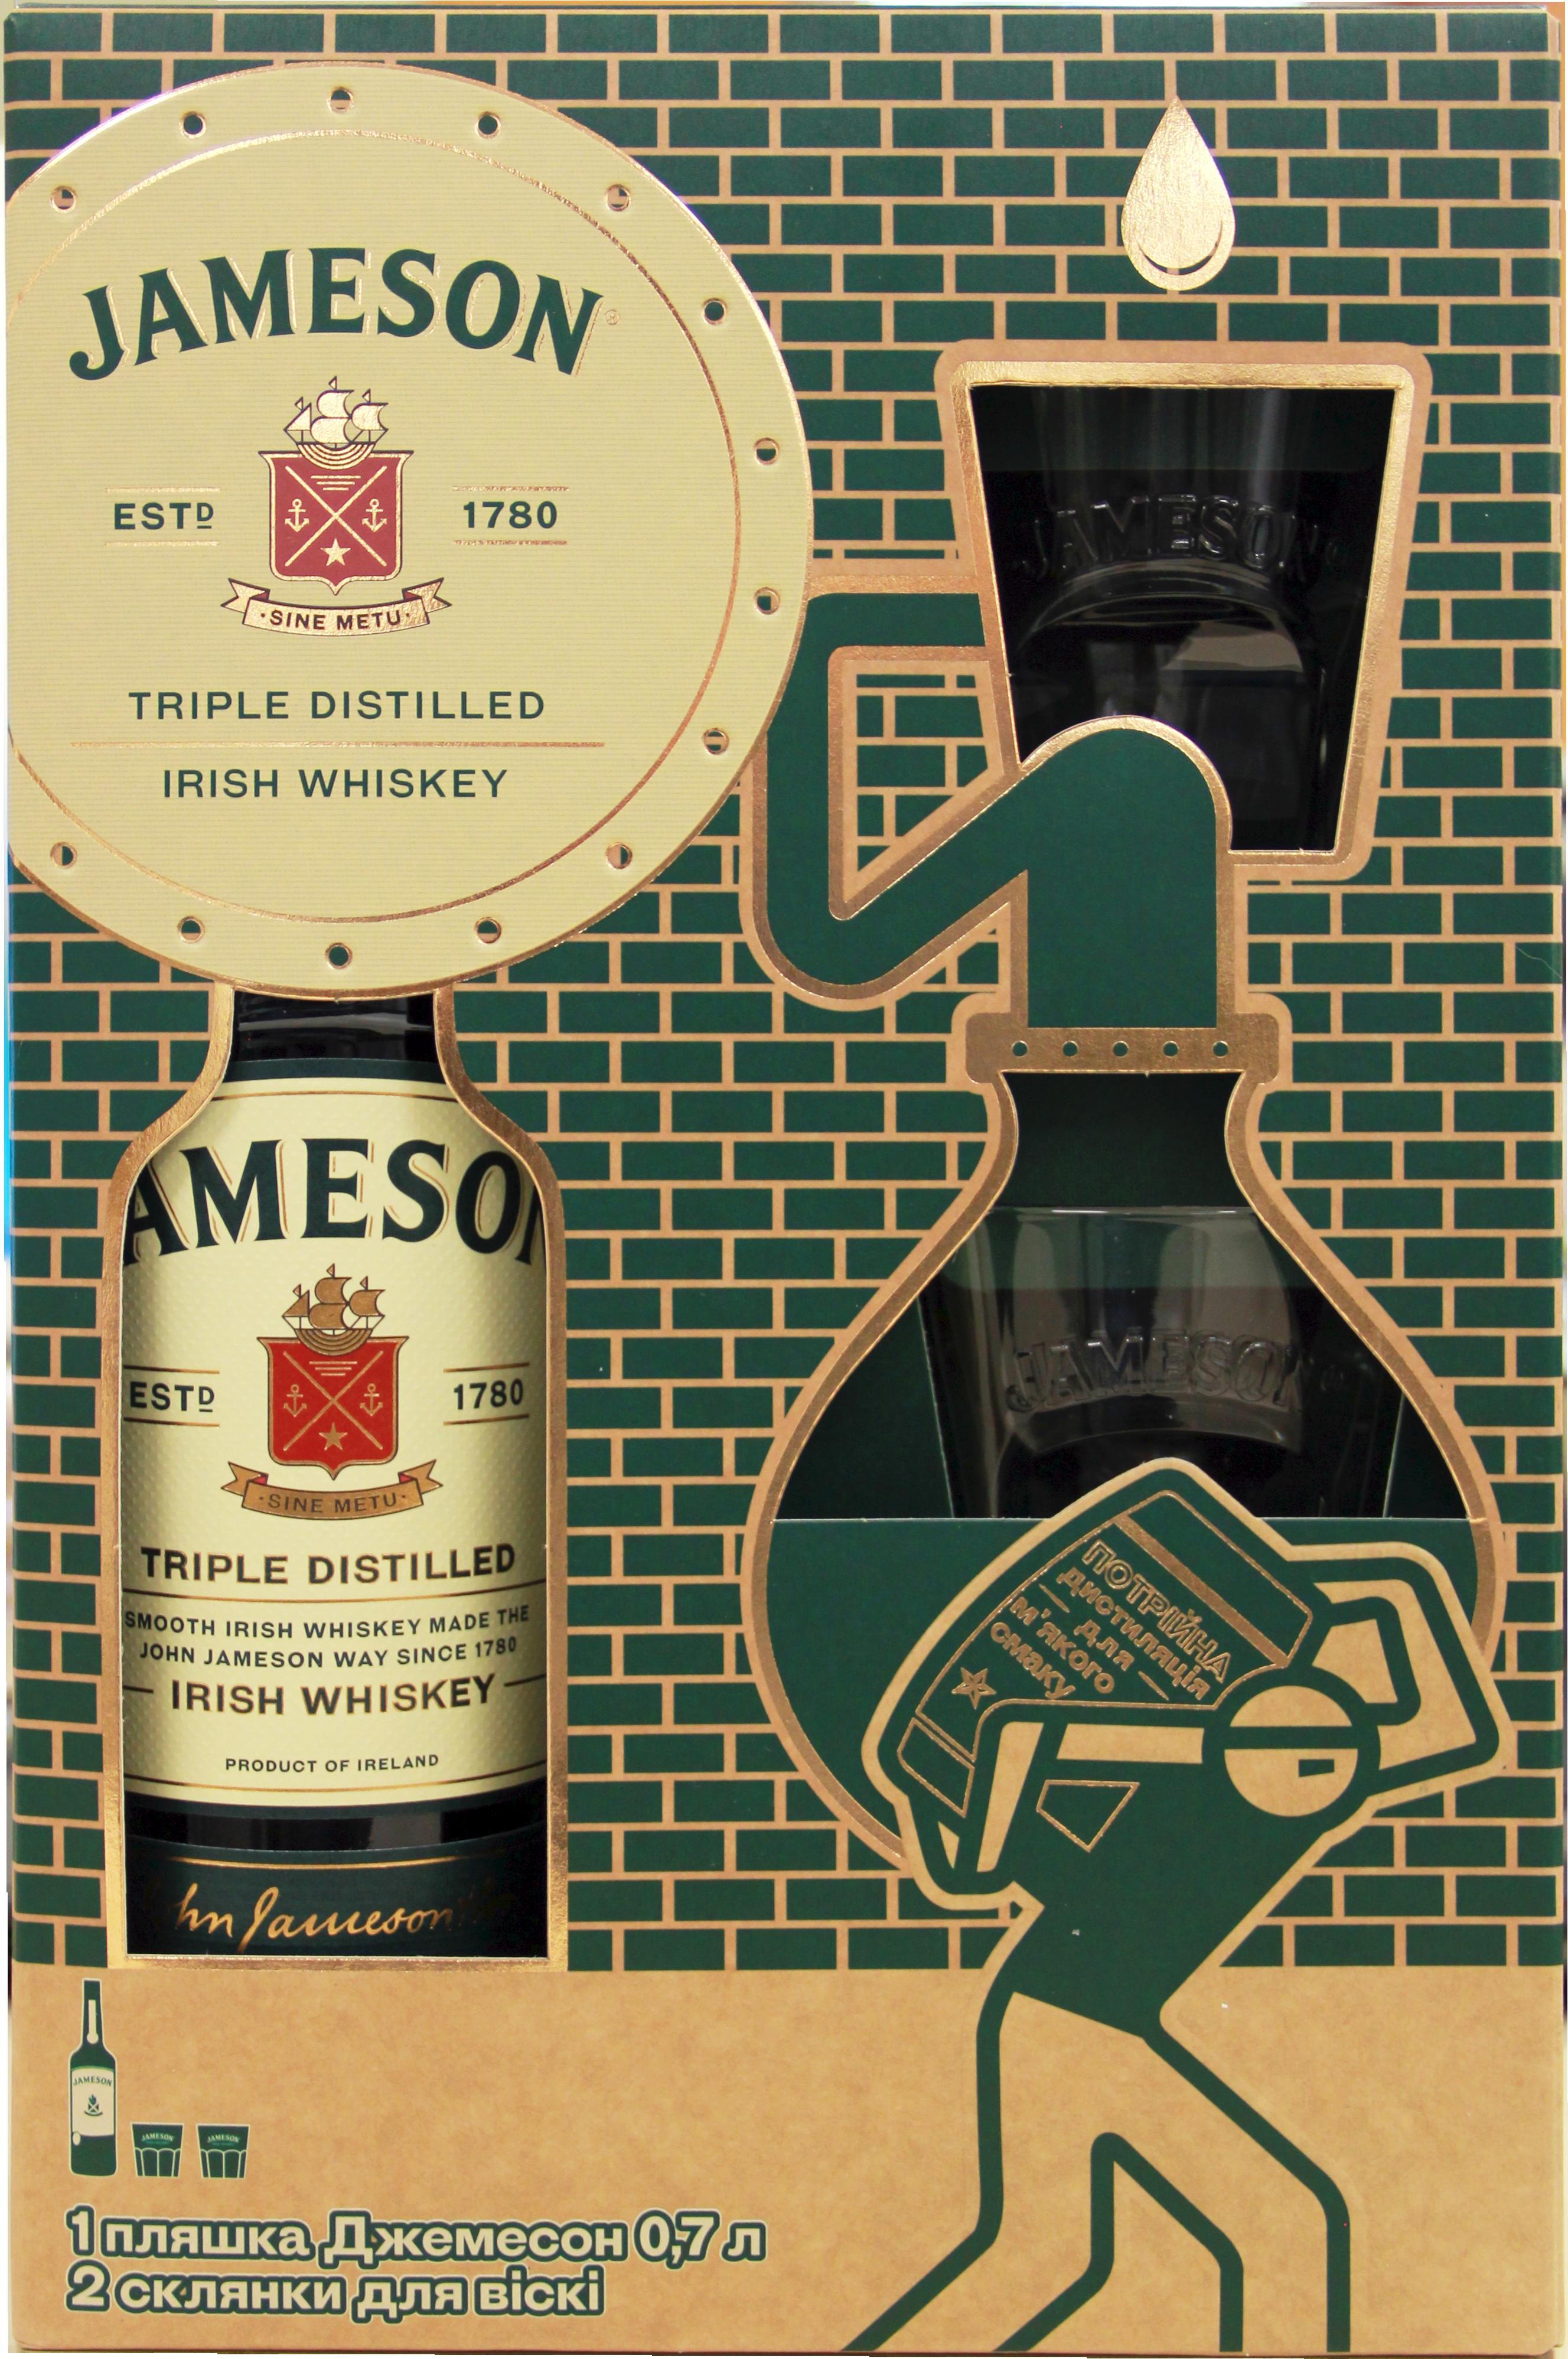 Виски джемисон (jameson) - описание, цена, фото, отзывы